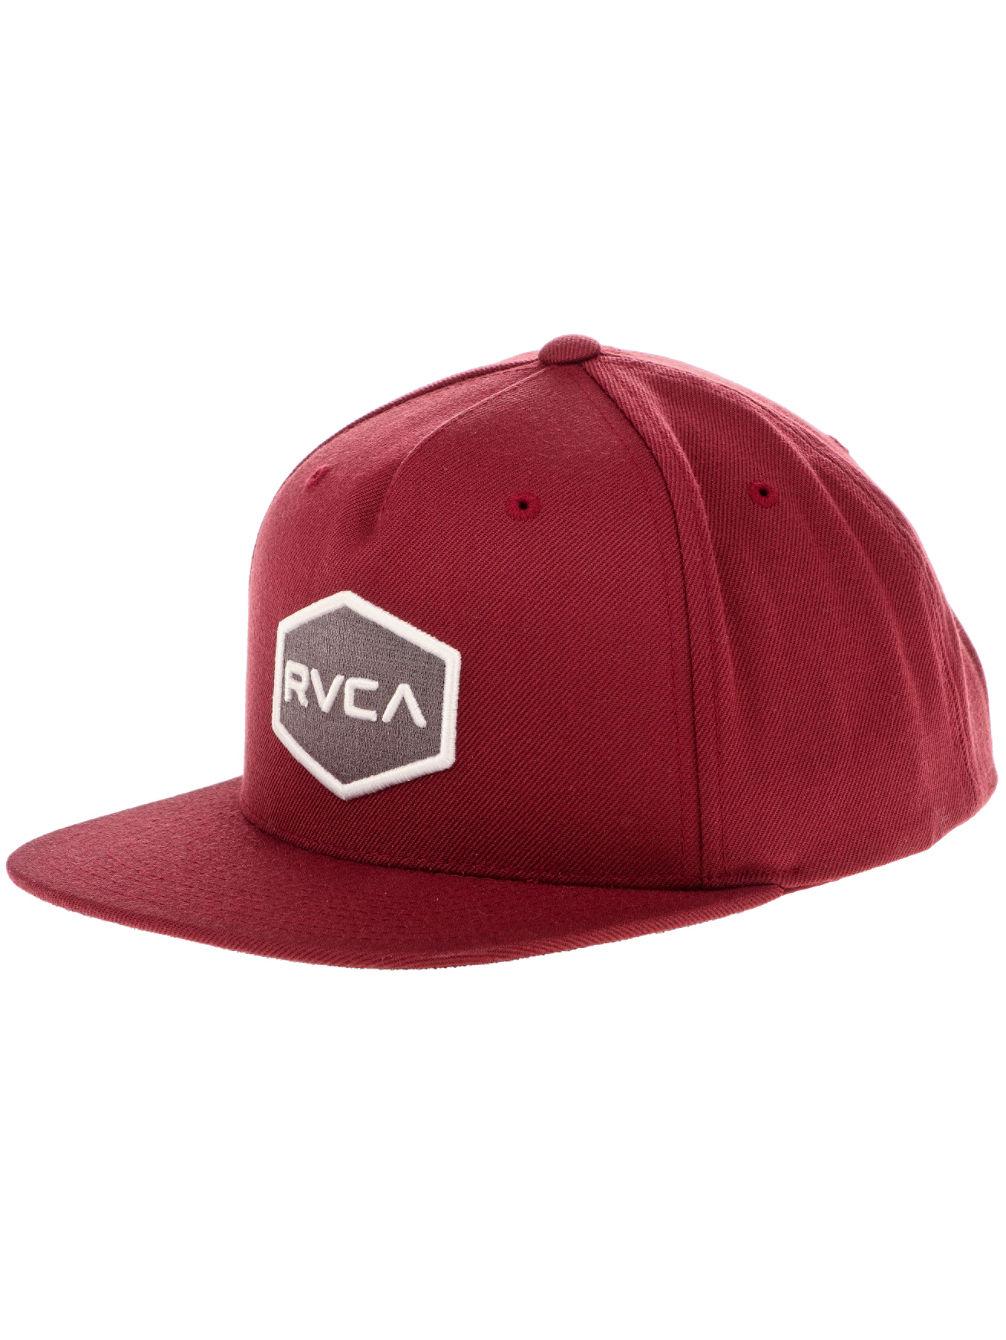 Compra RVCA Commonwealth Snapback Gorra en línea en blue-tomato.com 1ed440f2a92